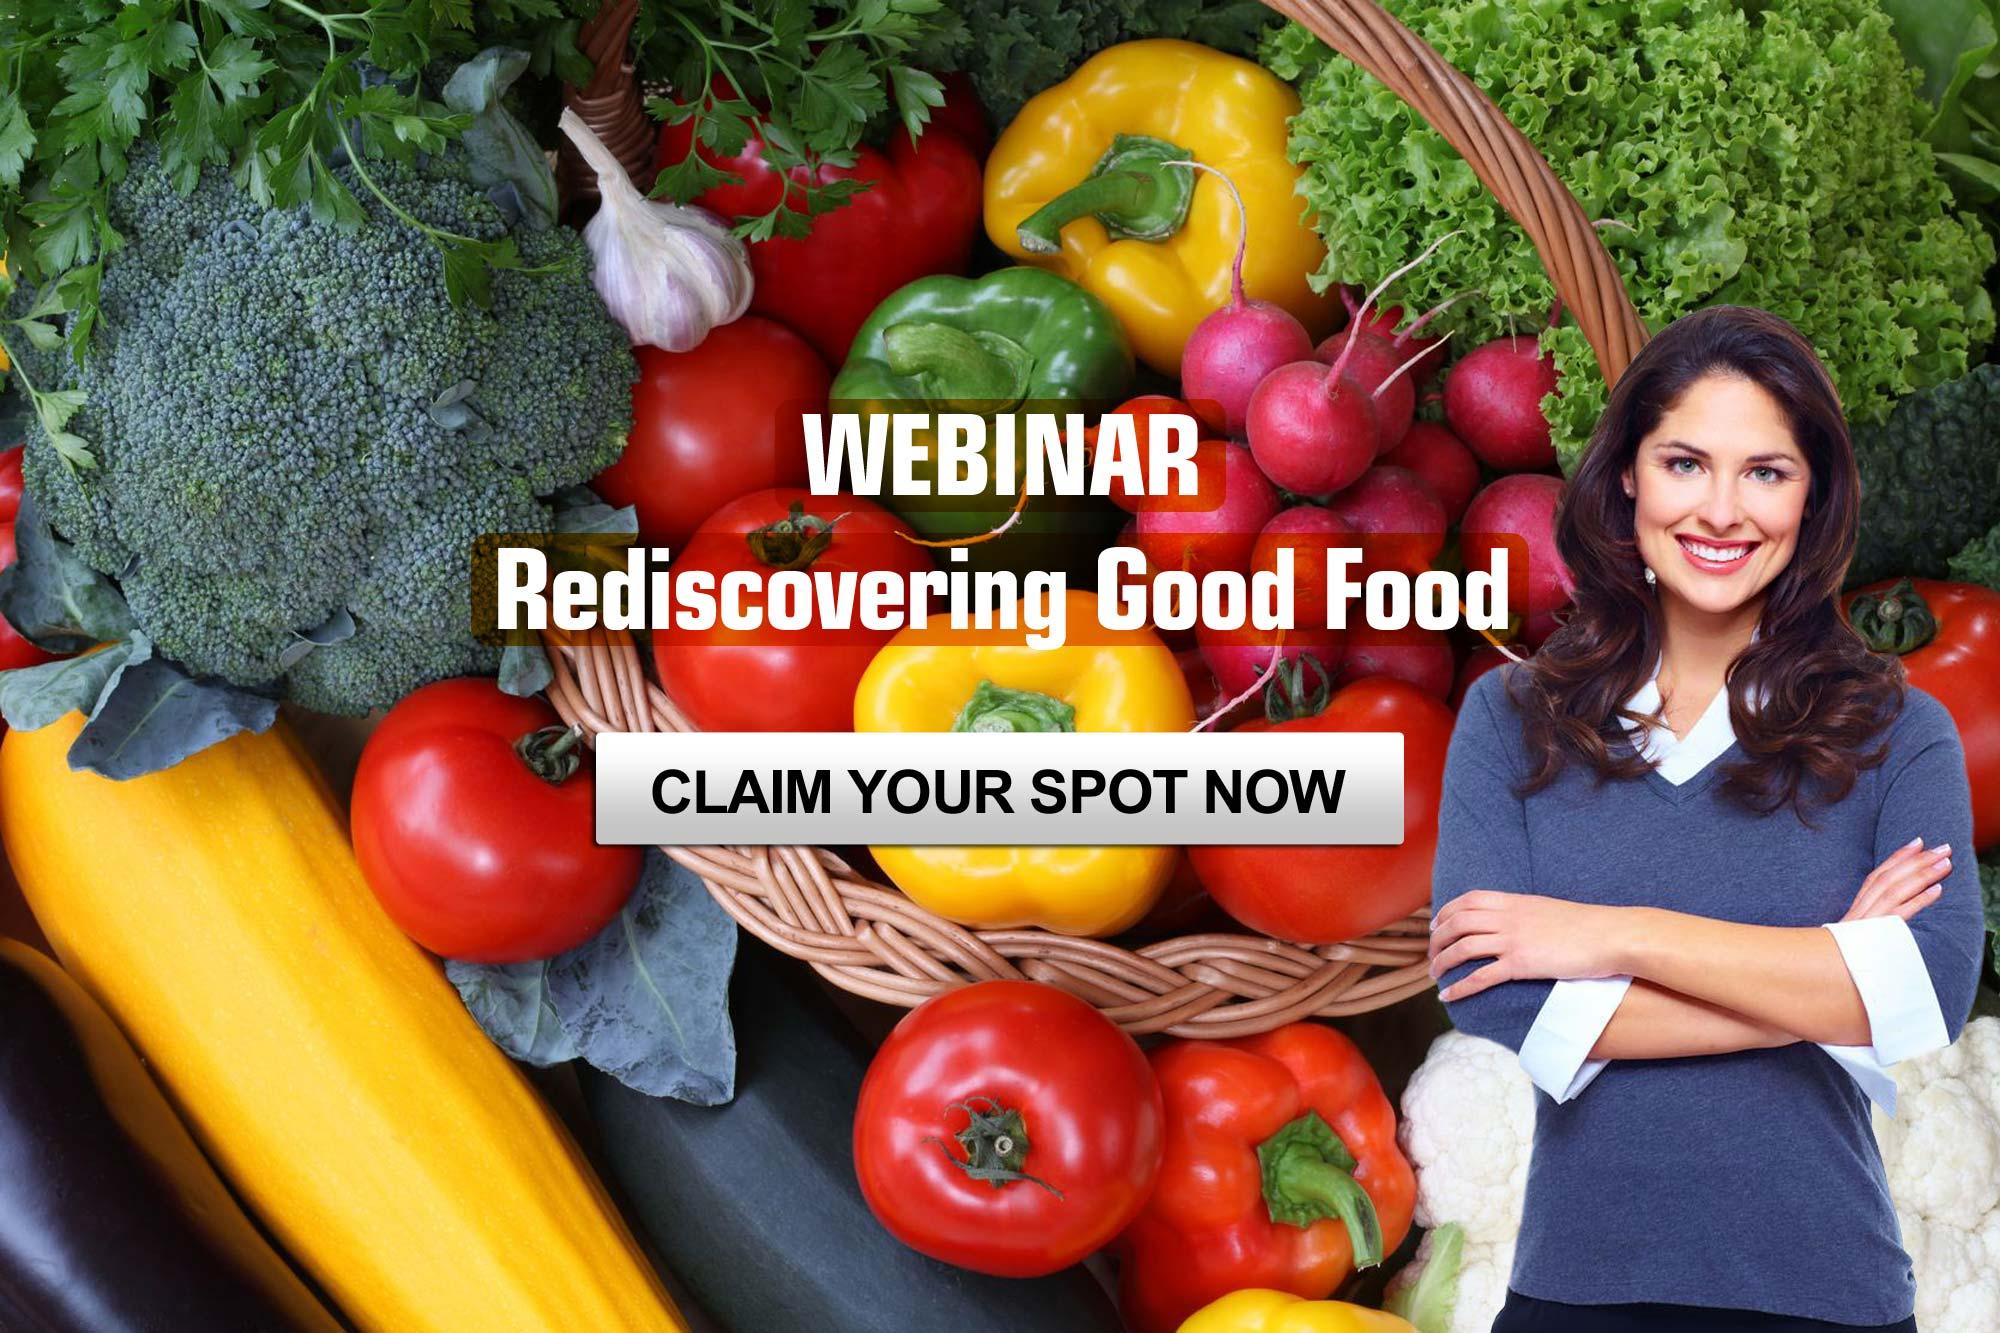 Webinar Rediscovering Good Food